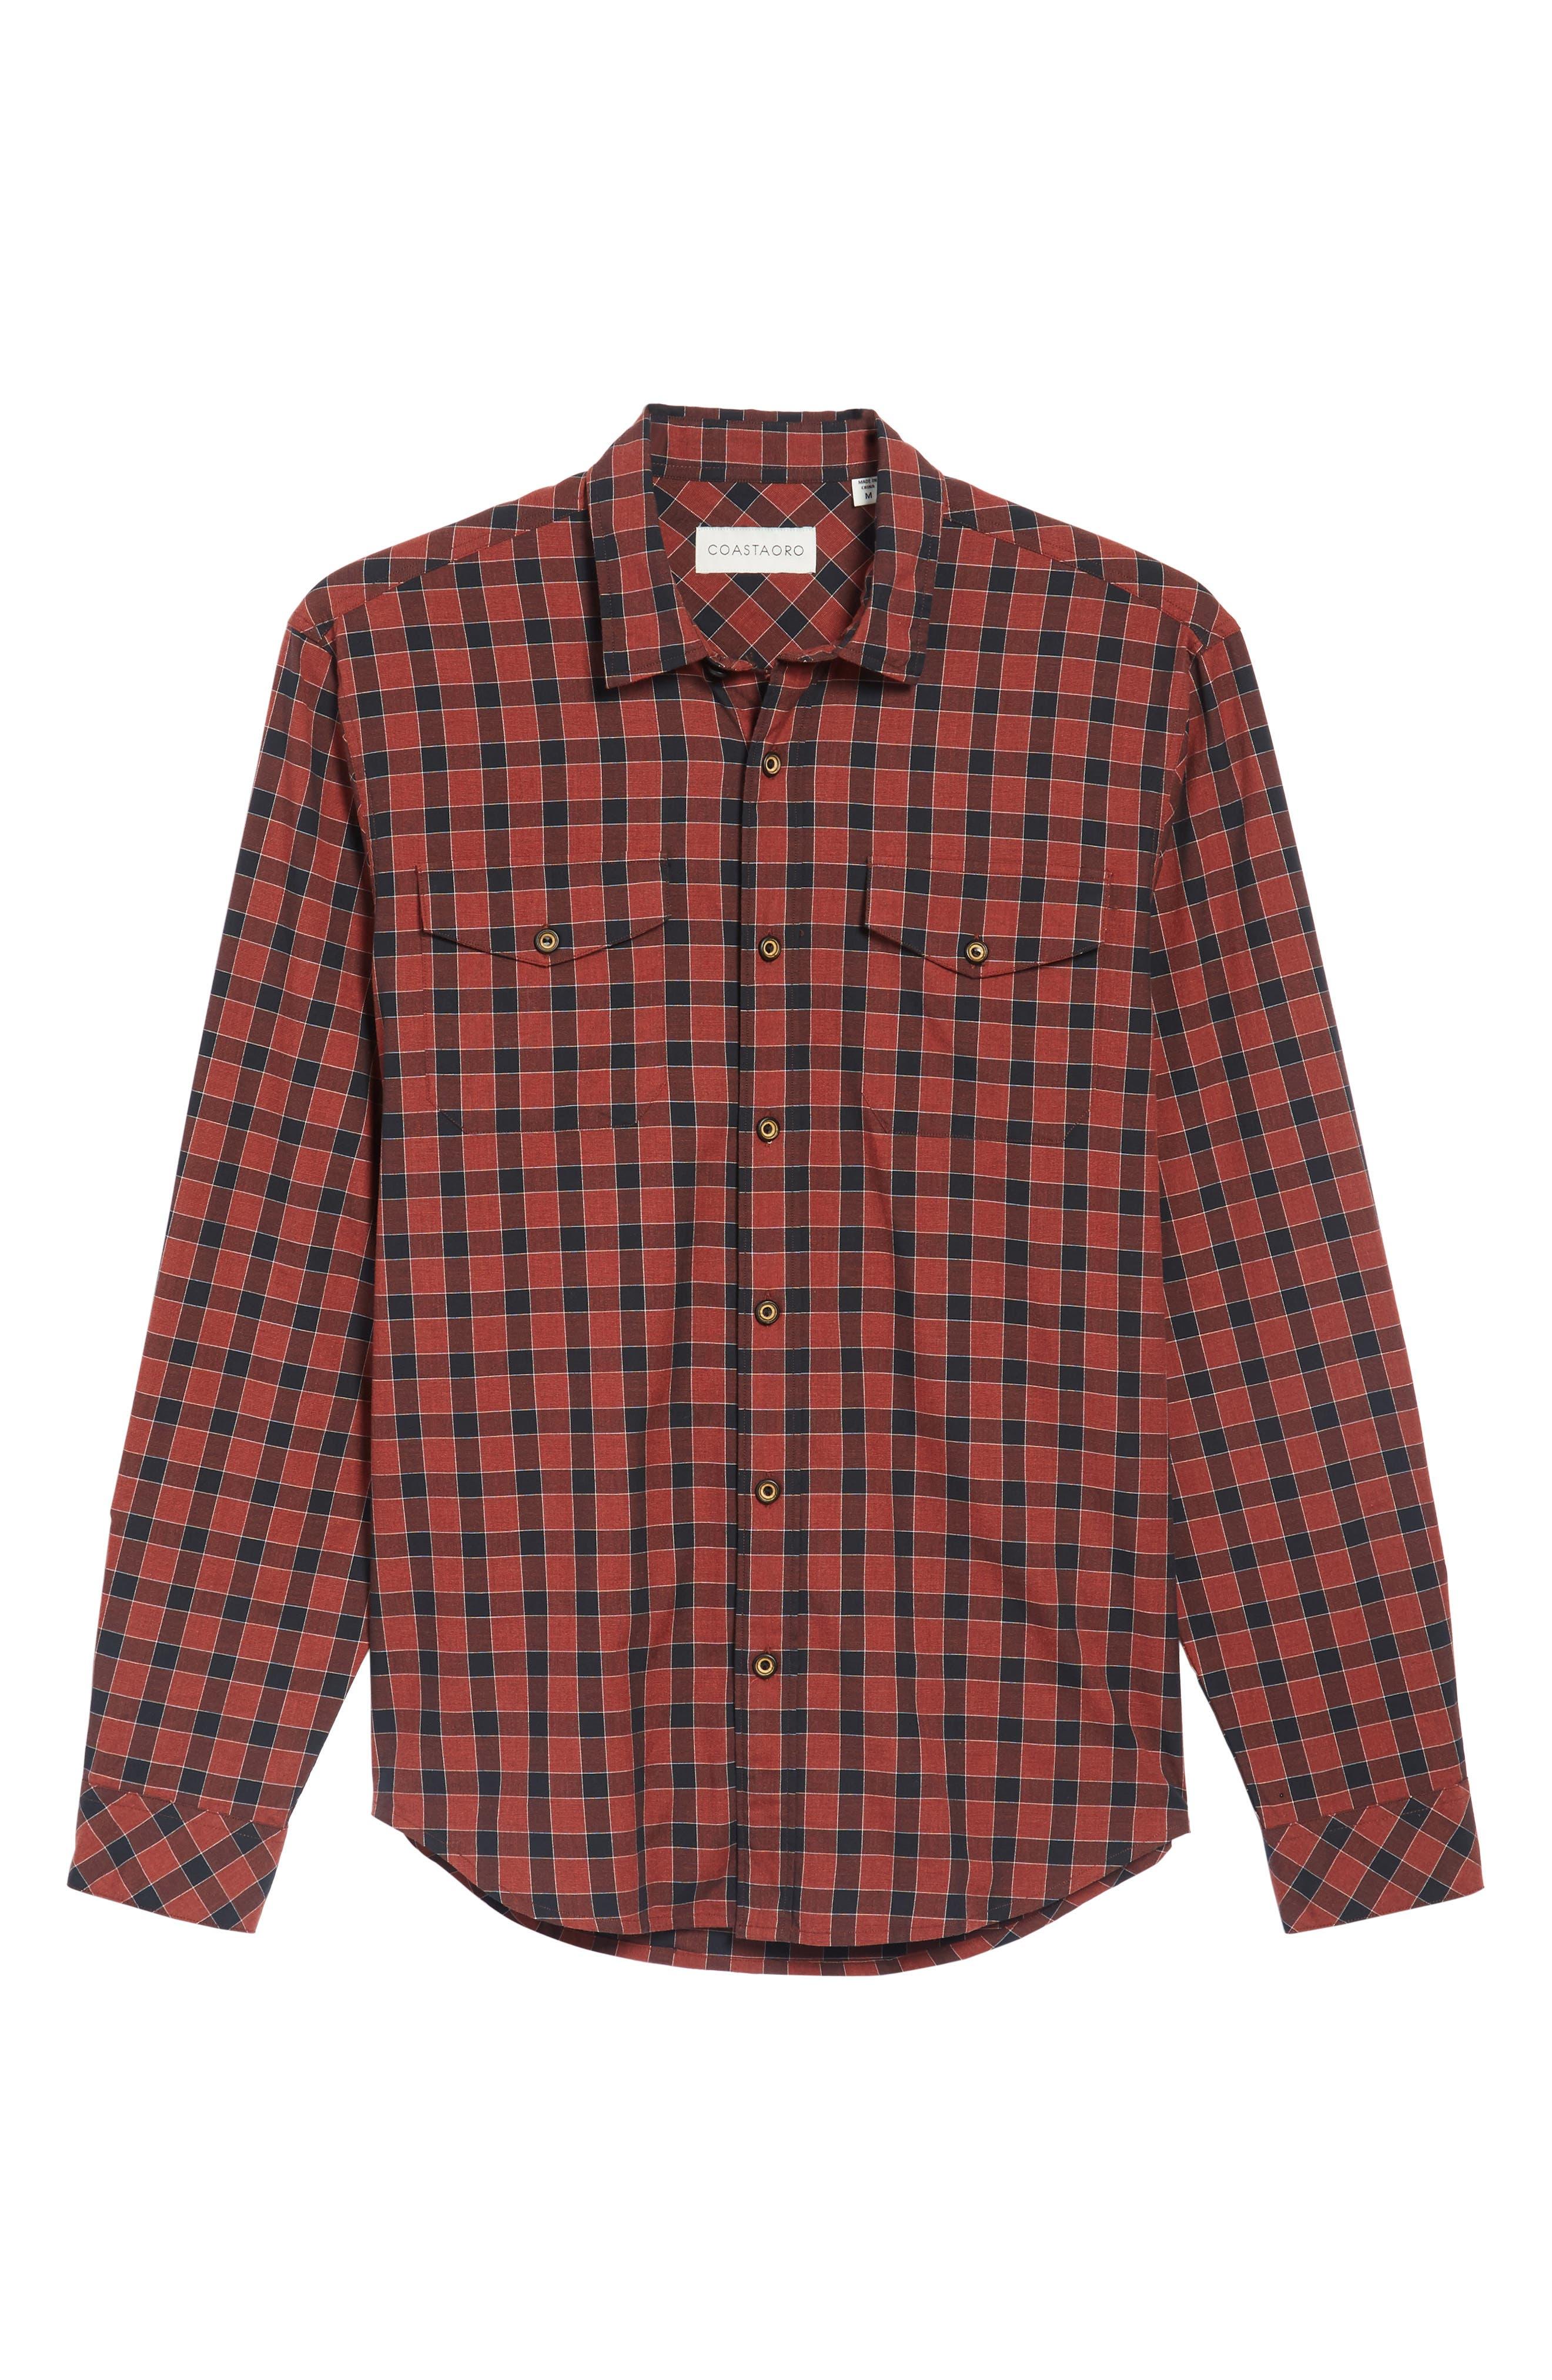 Lake Plaid Flannel Shirt,                             Alternate thumbnail 6, color,                             600